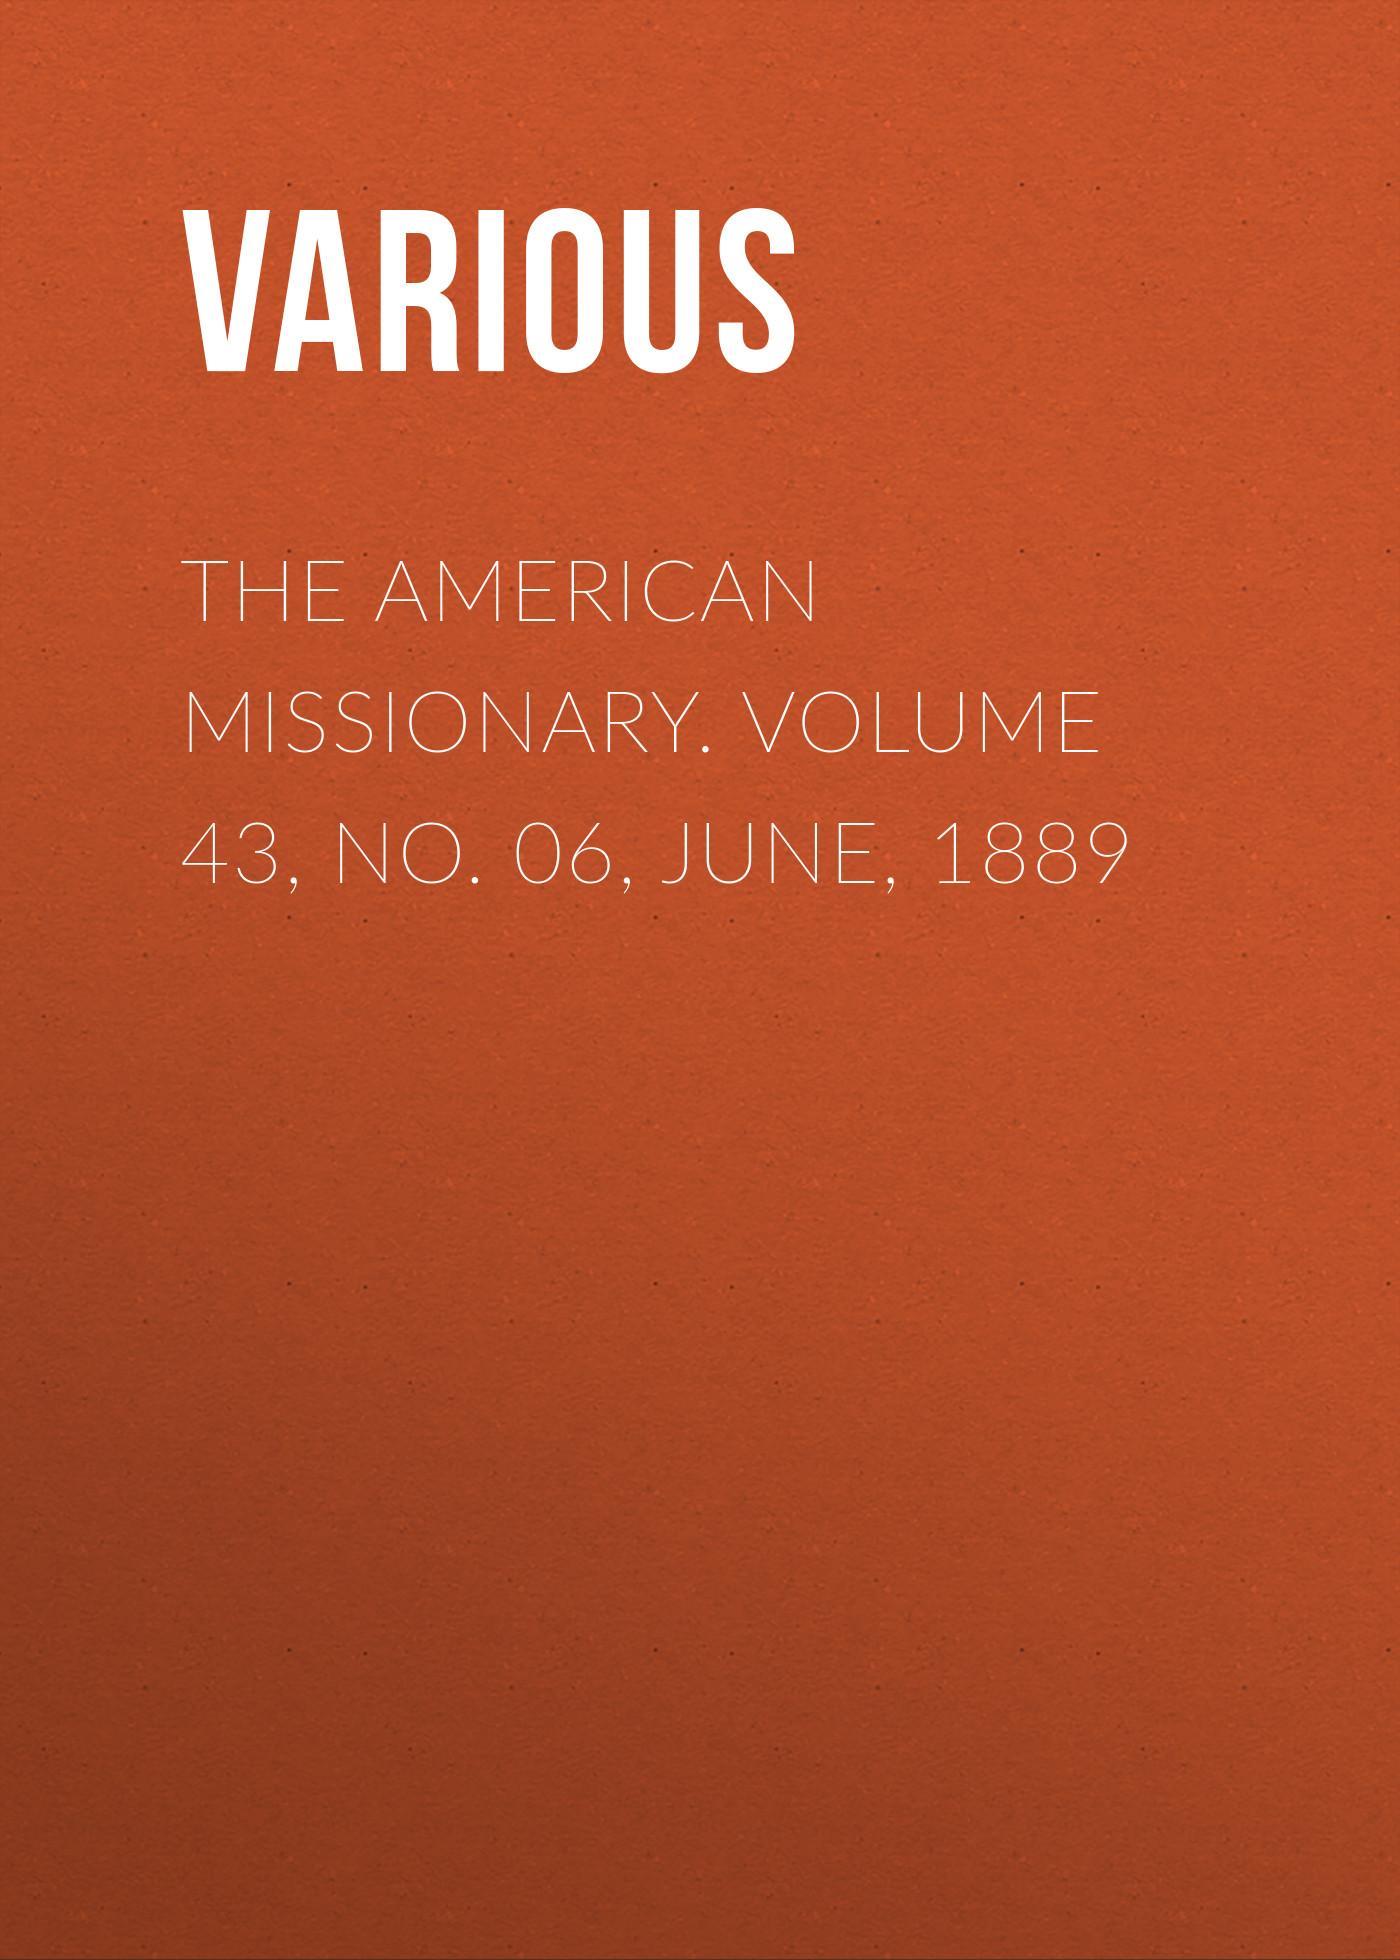 лучшая цена Various The American Missionary. Volume 43, No. 06, June, 1889